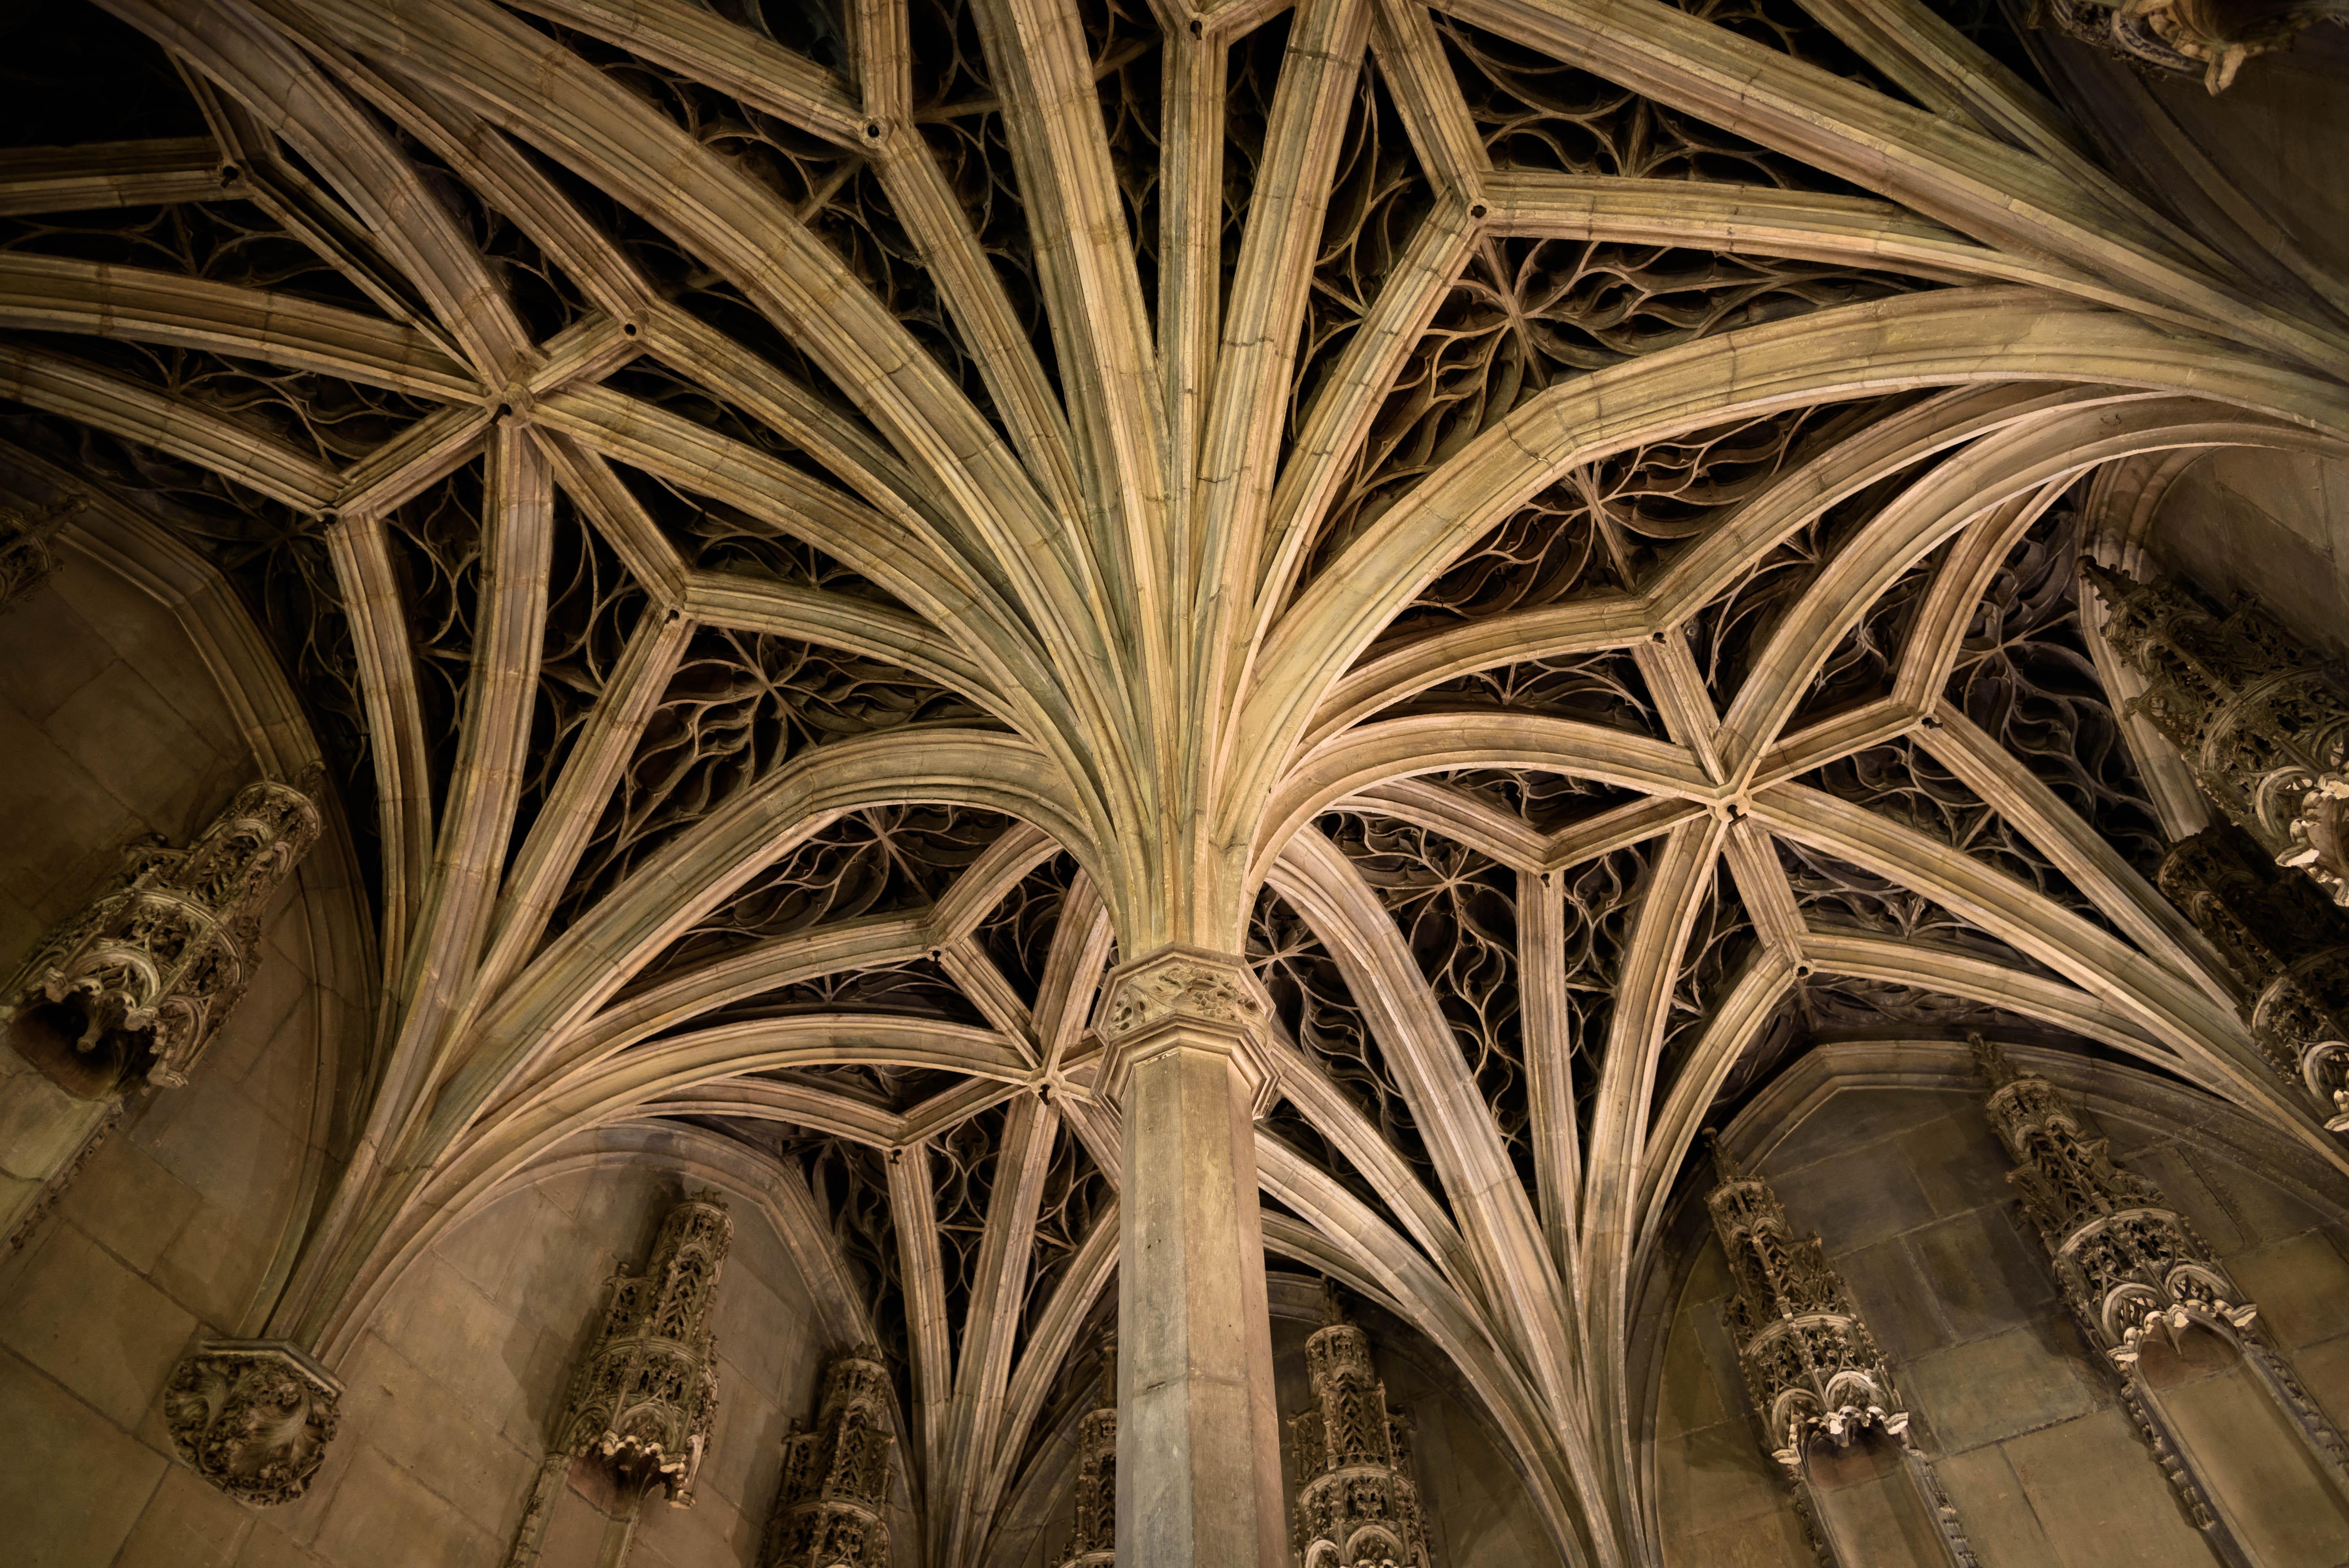 Free Images Light Architecture Wood Paris France Arch Ceiling Column Museum Cathedral Chapel Nikon Places 2015 Art Arches Pillars